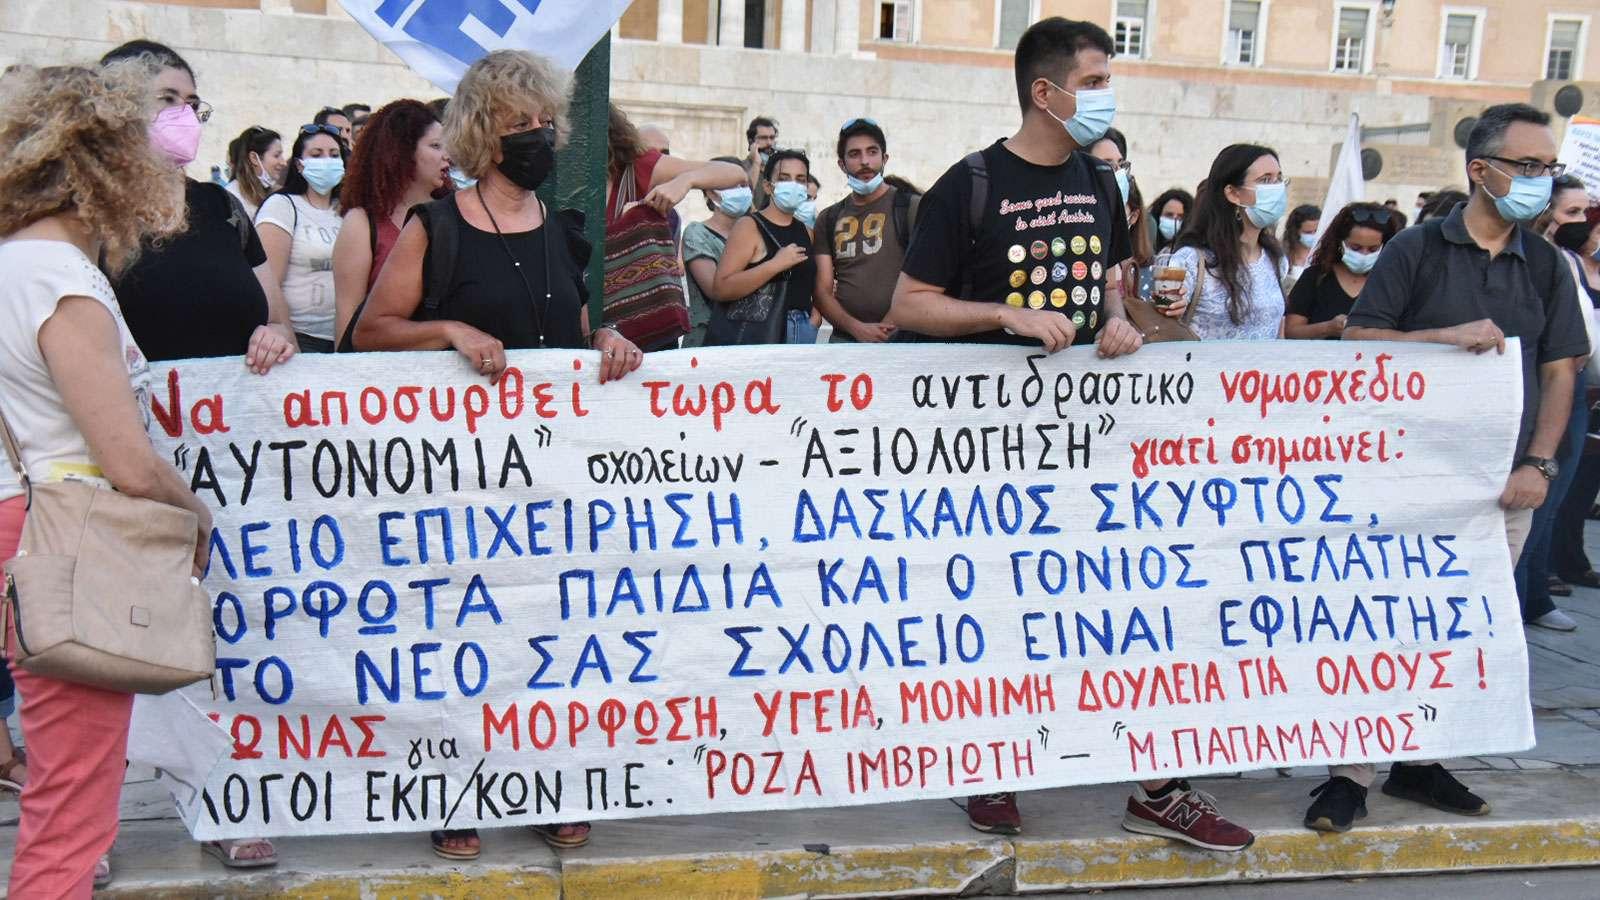 kinhtopoihsh paideia Πανεκπαιδευτικό Σύνταγμα 5